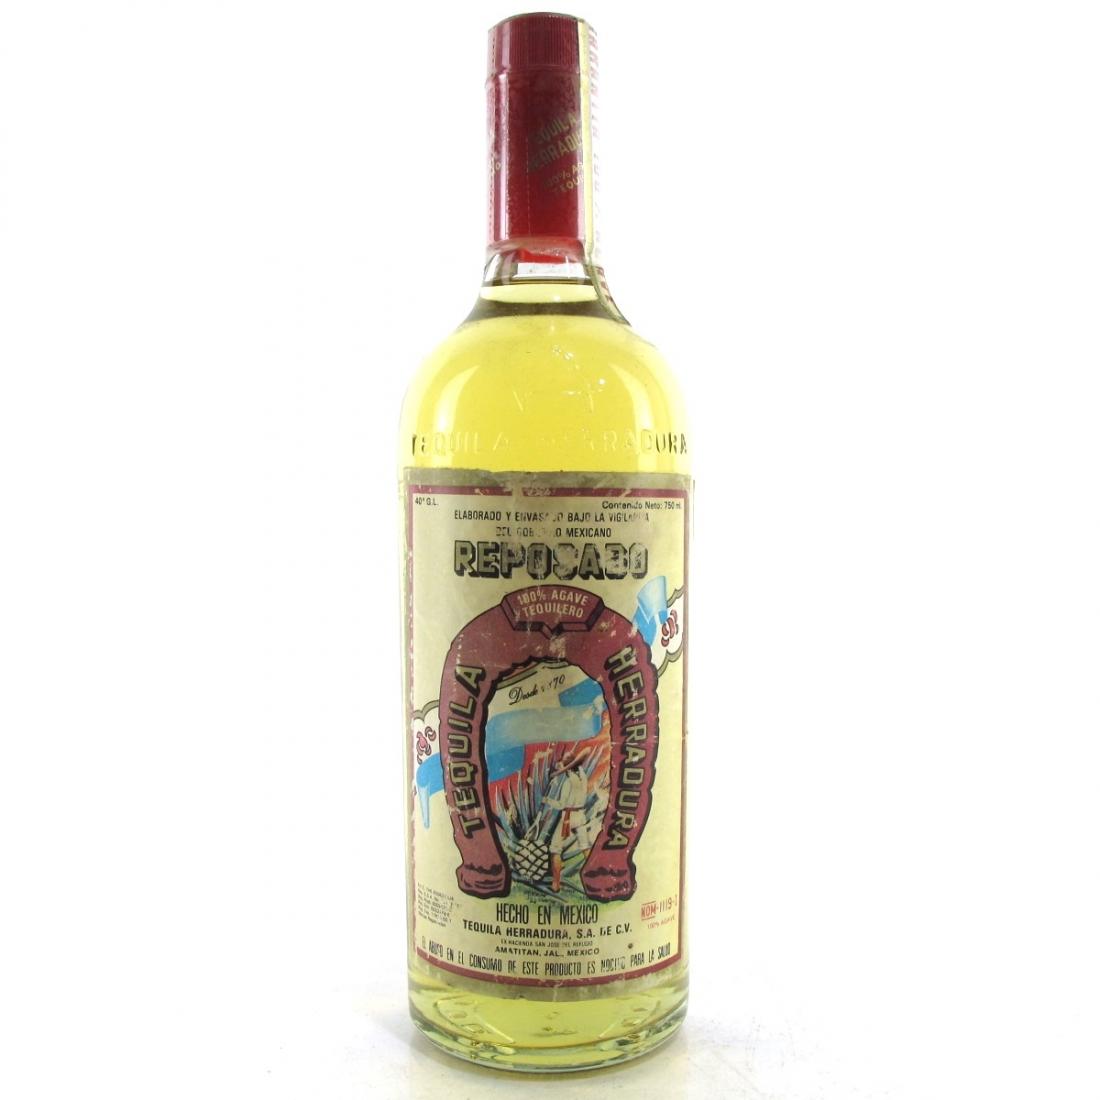 Herradura Reposado Tequila circa 1970s